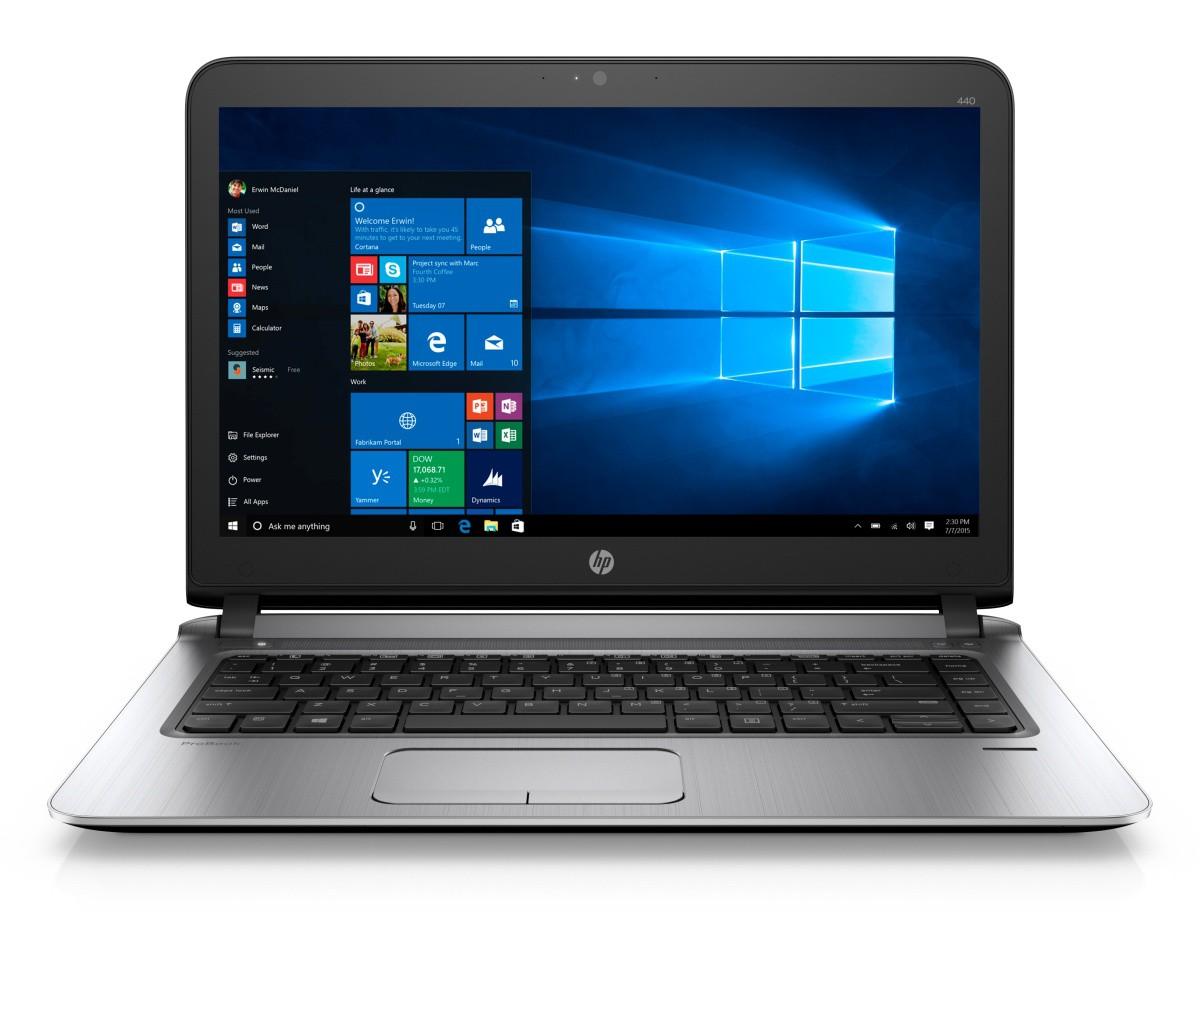 Notebook HP ProBook 440 G3 (T6P20ES)